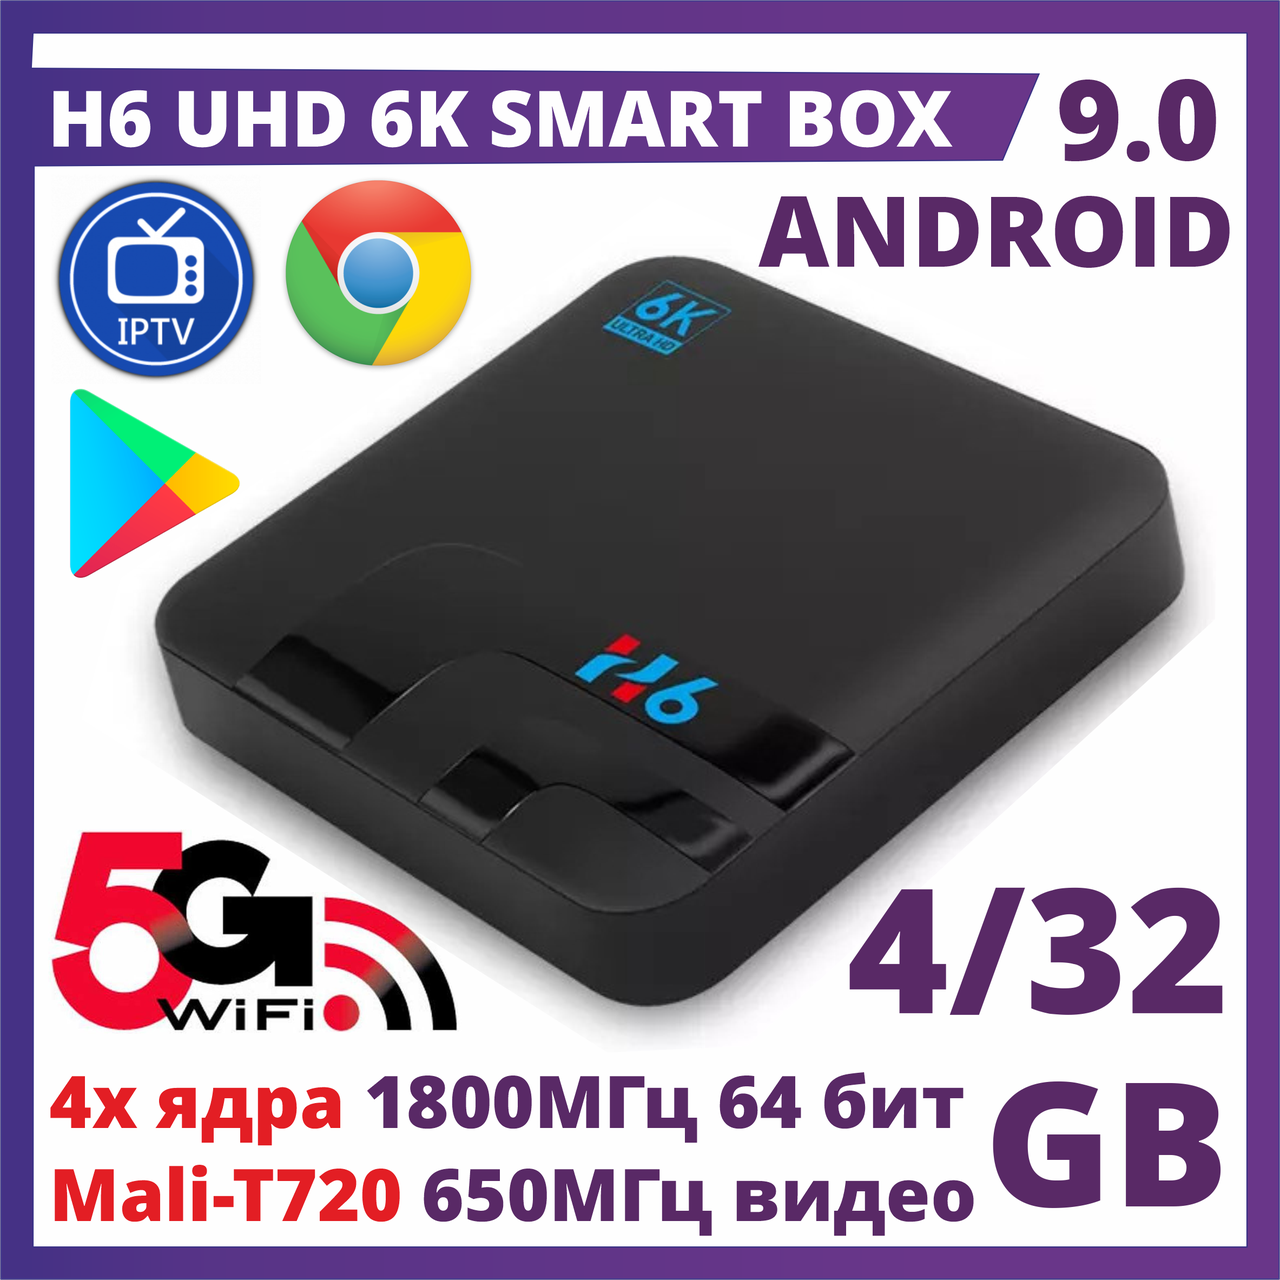 H6 Smart TV Box 4 32gb Android 9.0 Allwinner UHD 4K Медиаплеер, Cortex A53,ТВ приставка андроид smartbox